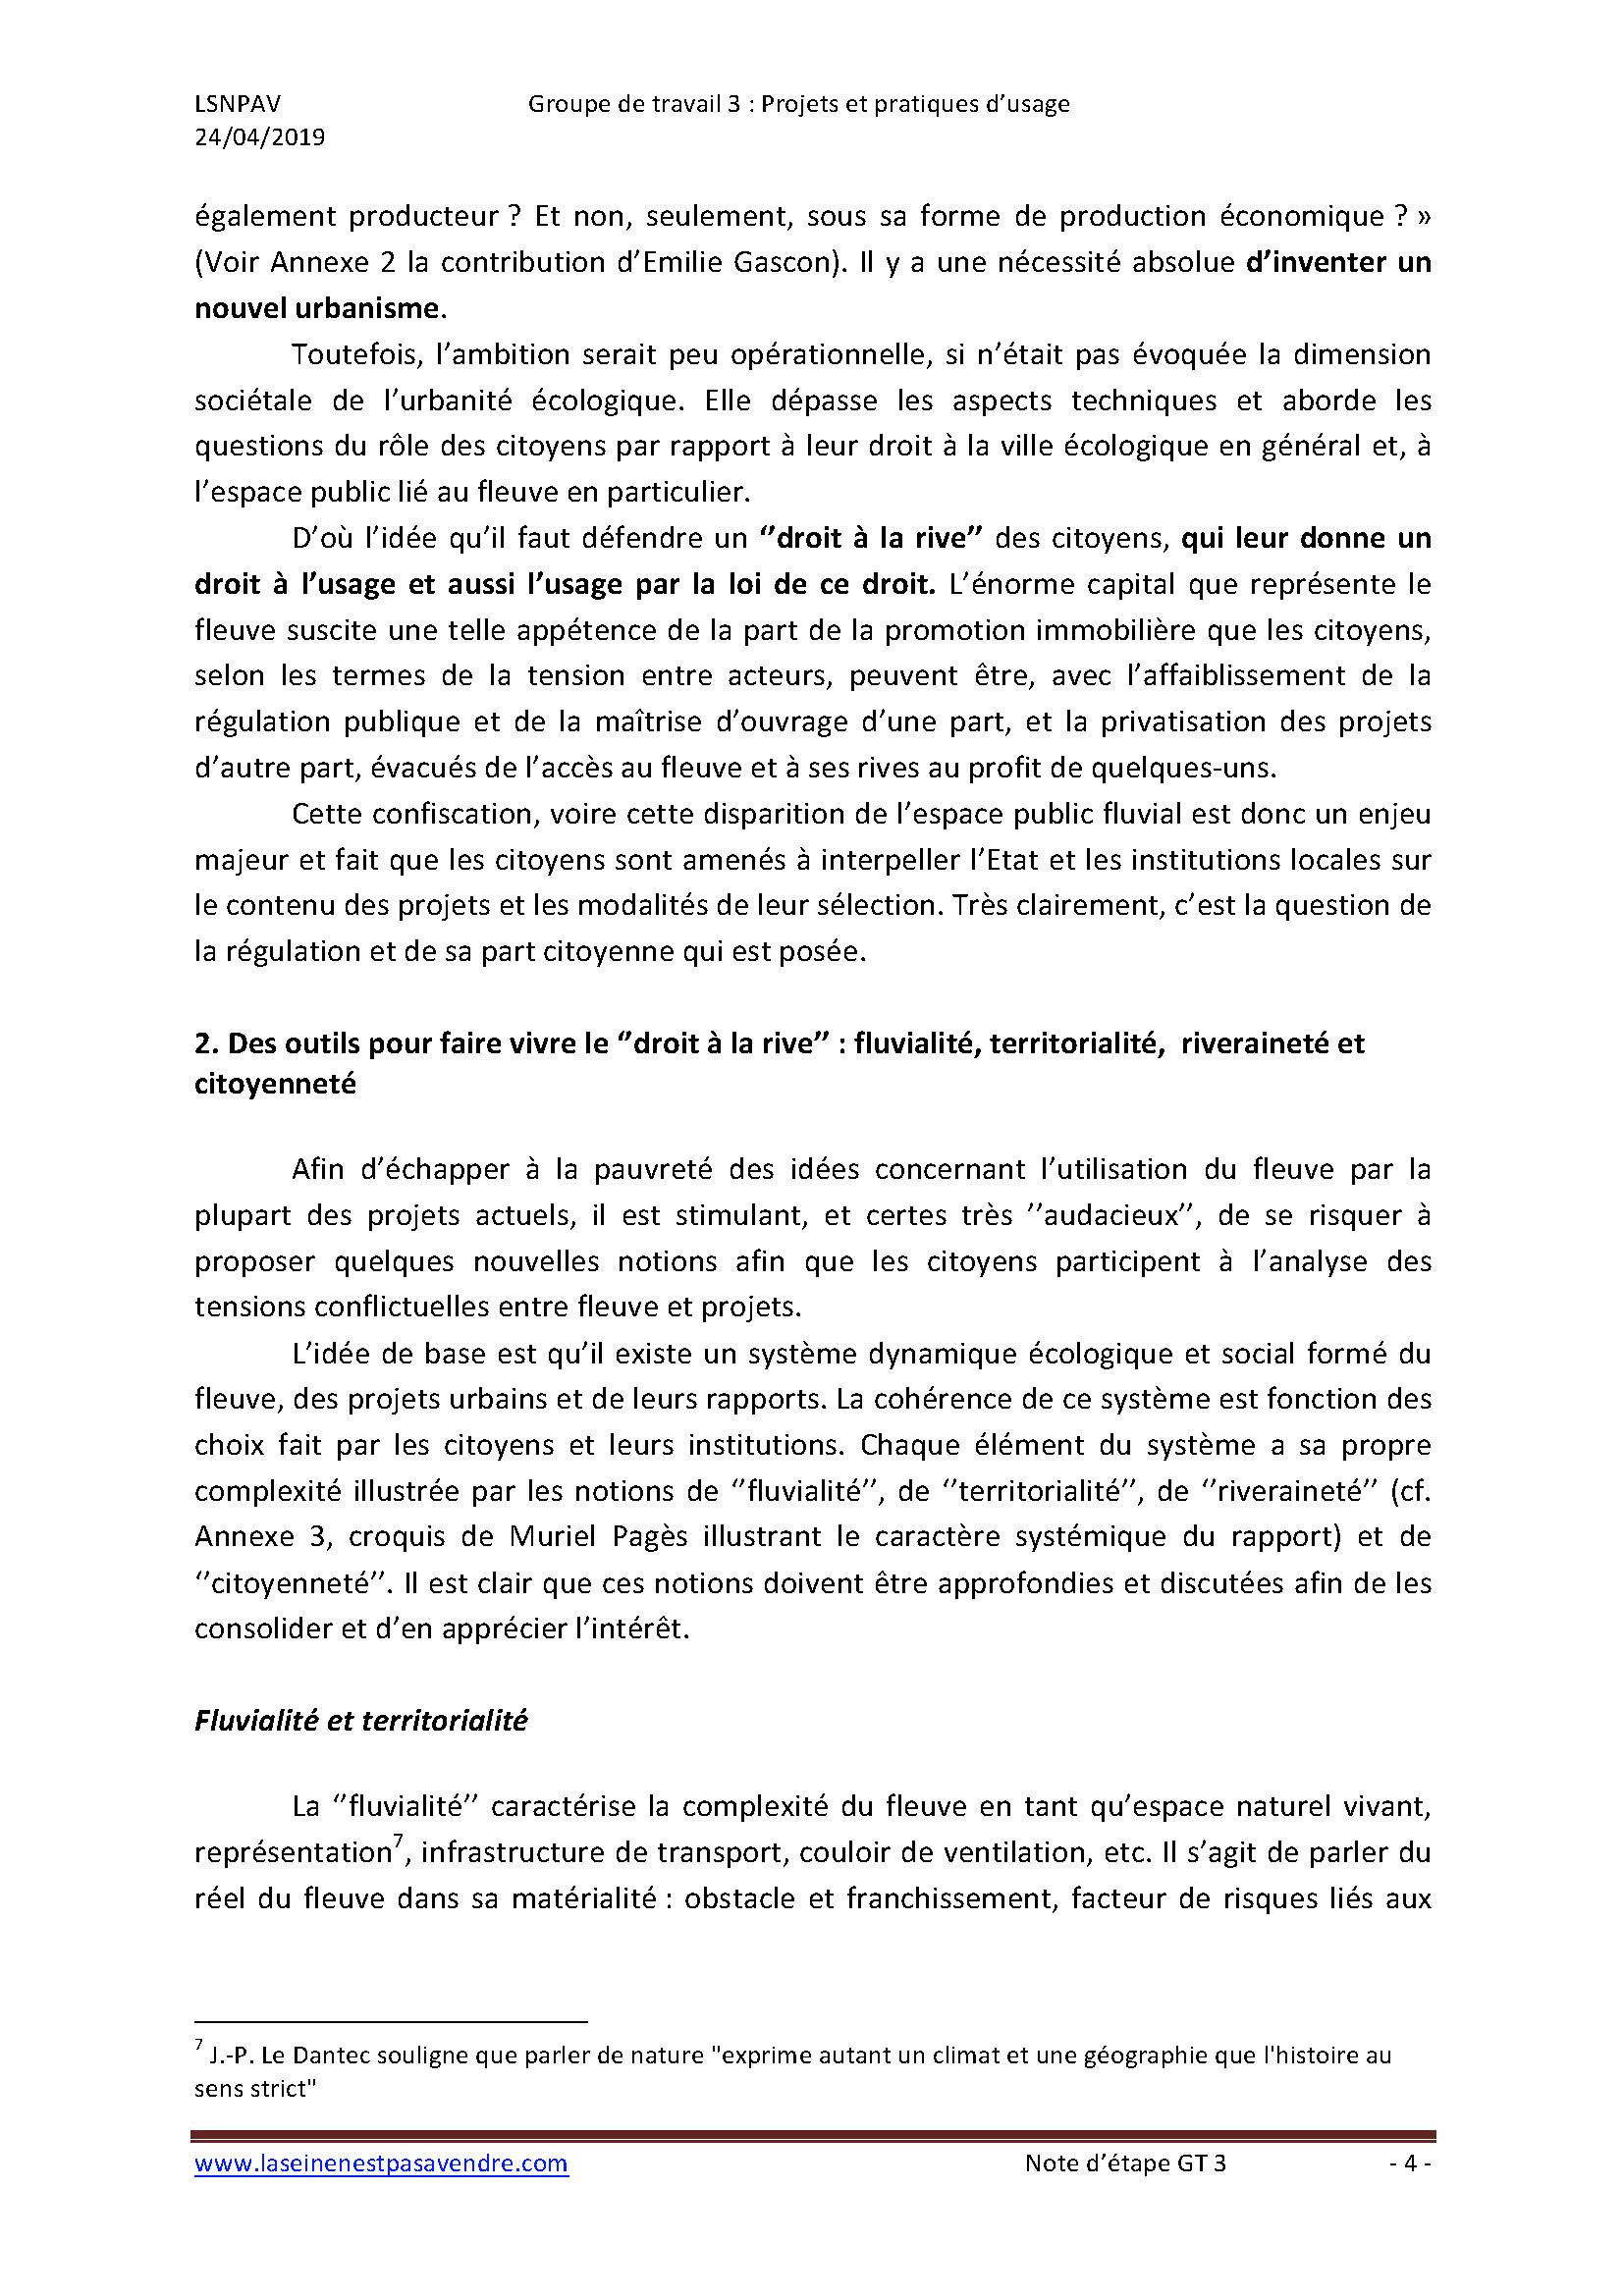 GT 3 Note d'étape_Page_04.jpg